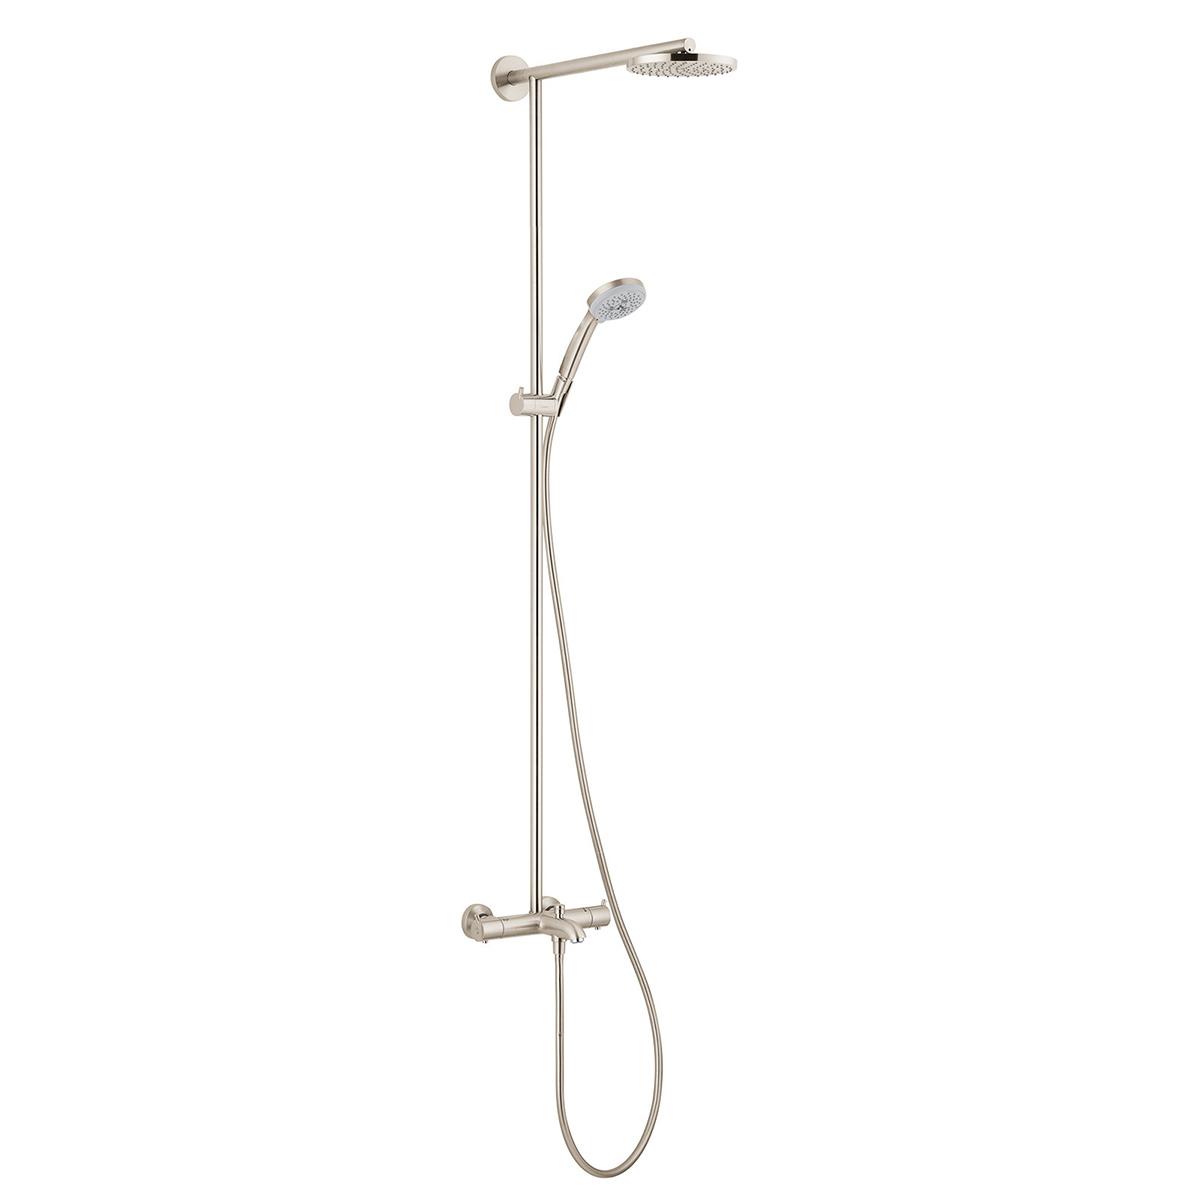 Bath4all Hansgrohe 27146821 Brushed Nickel Raindance Tub Shower